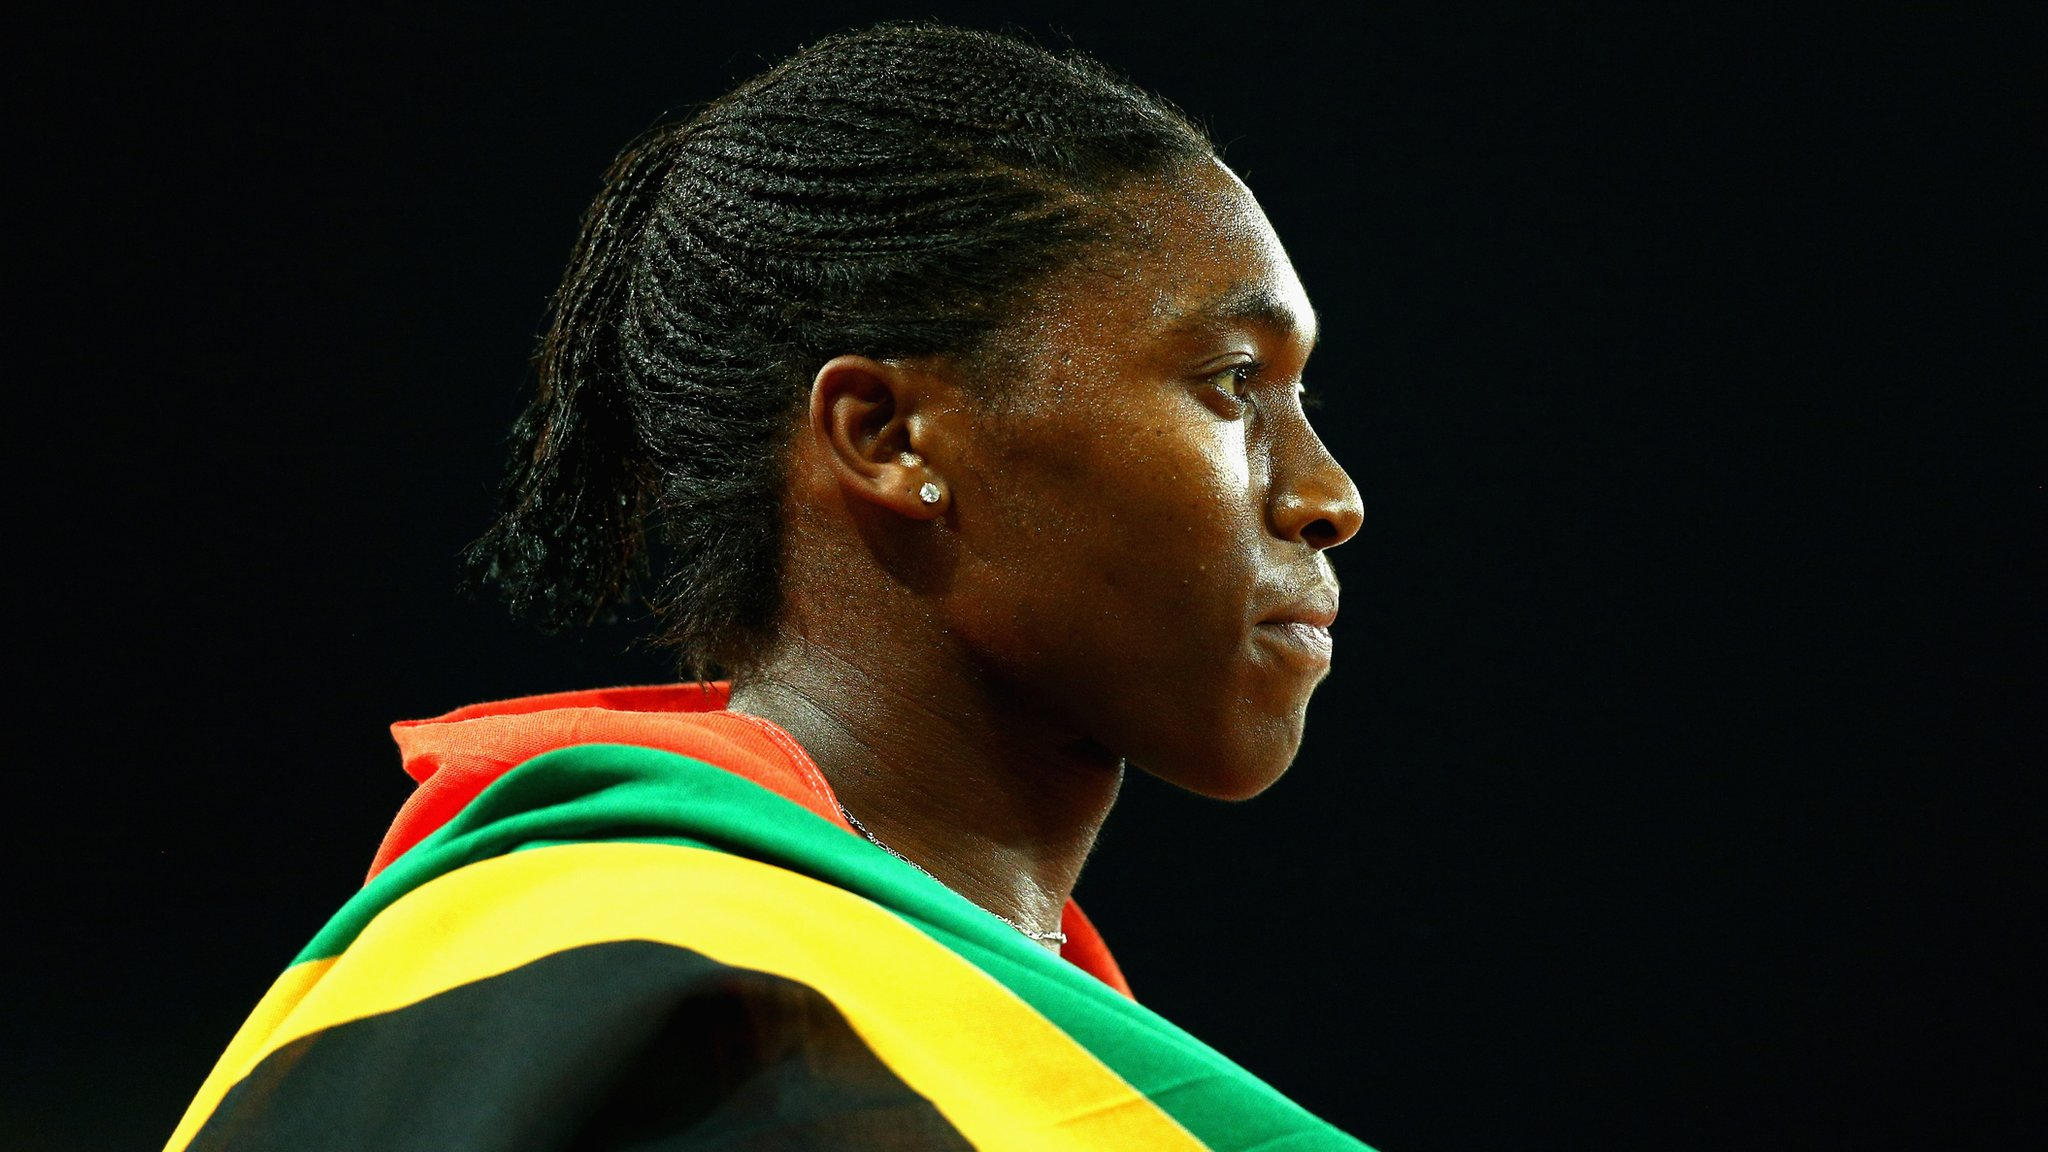 IAAF testosterone rule 'humiliating and harmful' - United Nations